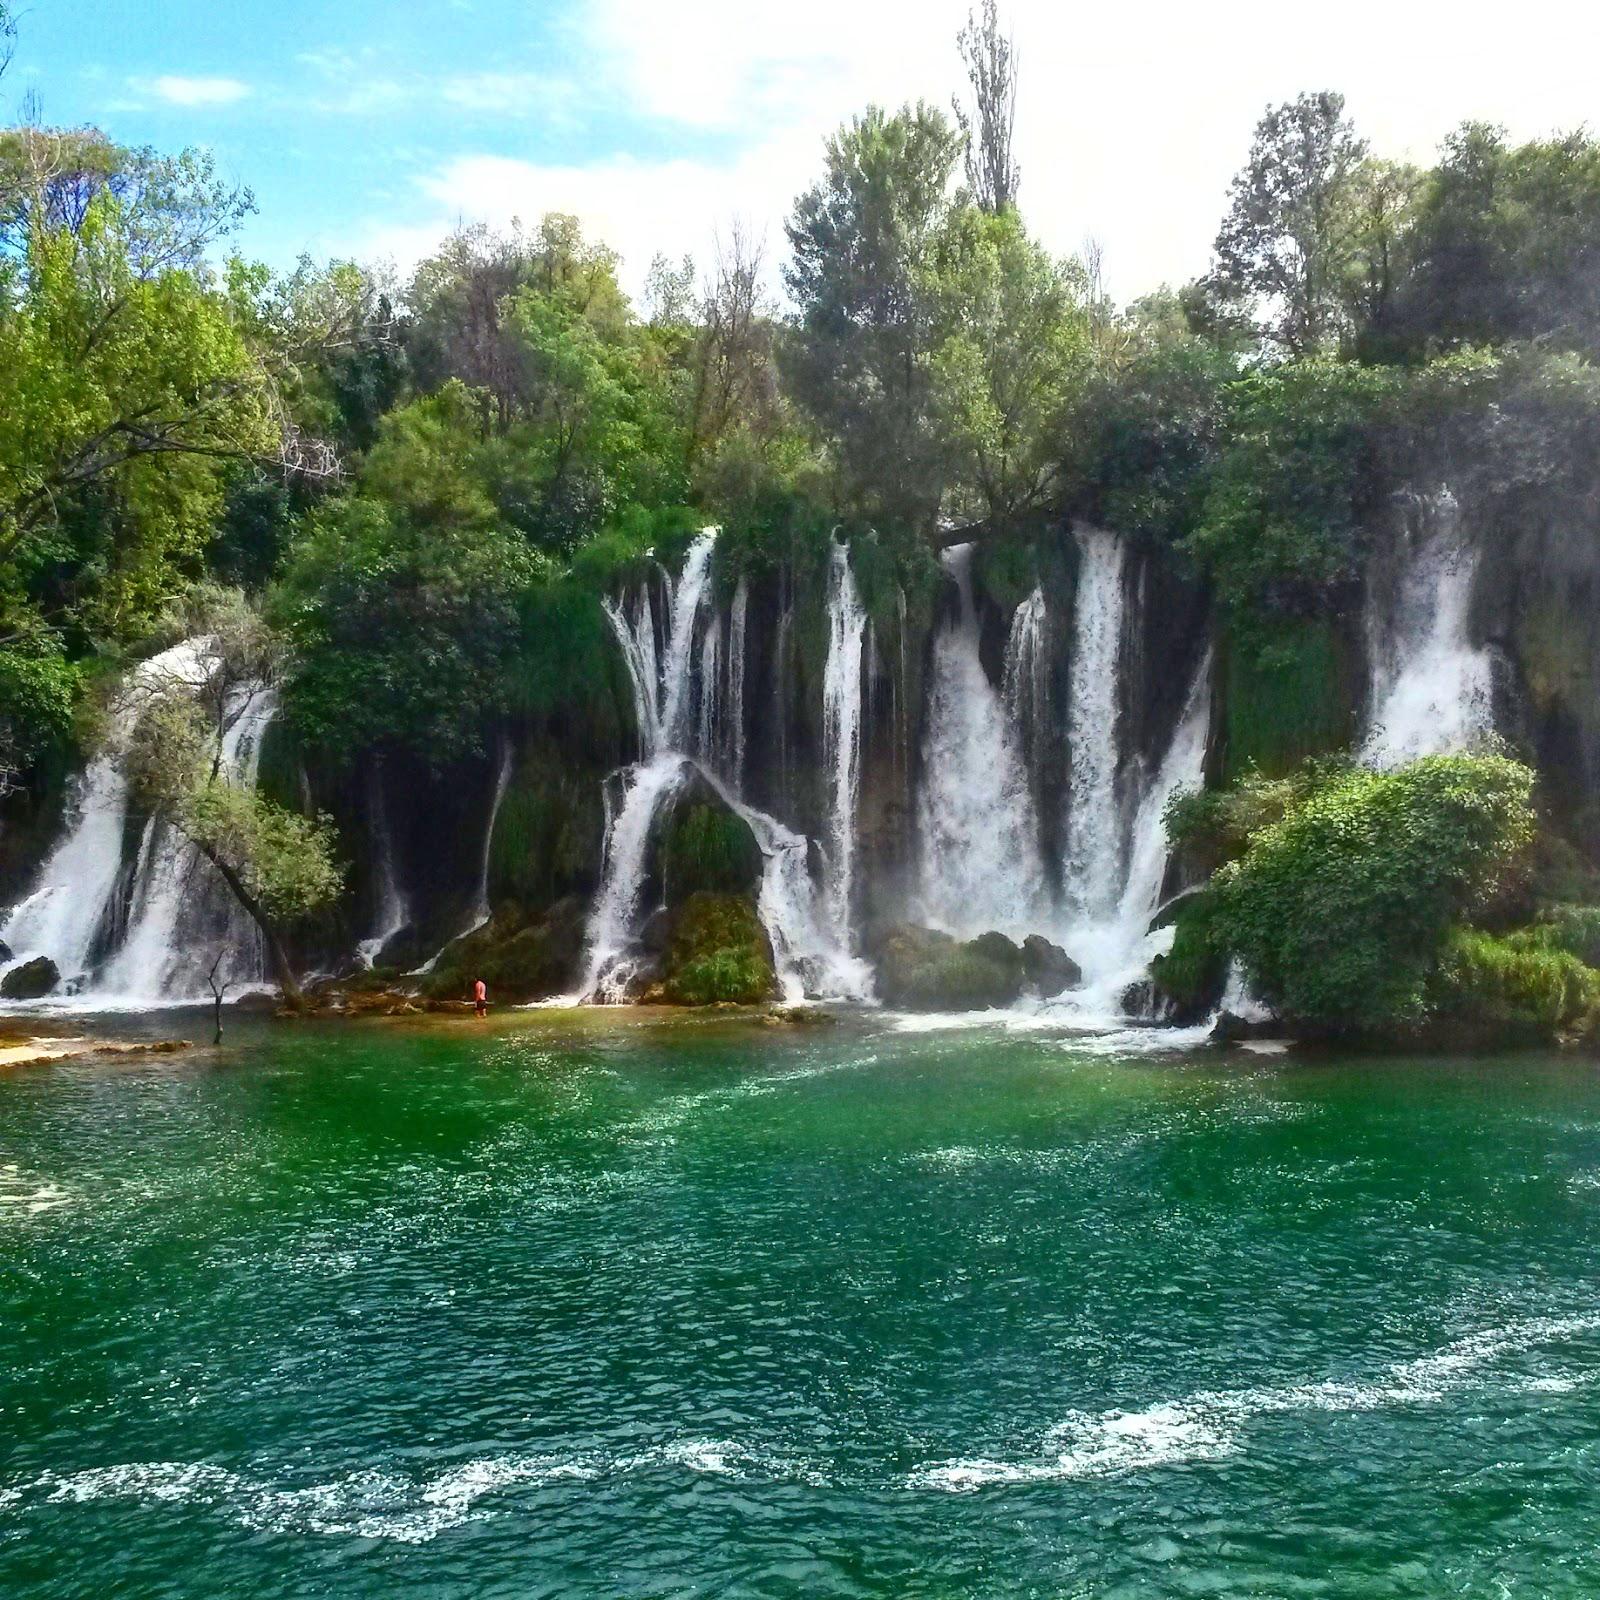 Vodič kroz vodopad Kravice i Međugorje, Bosna i ...